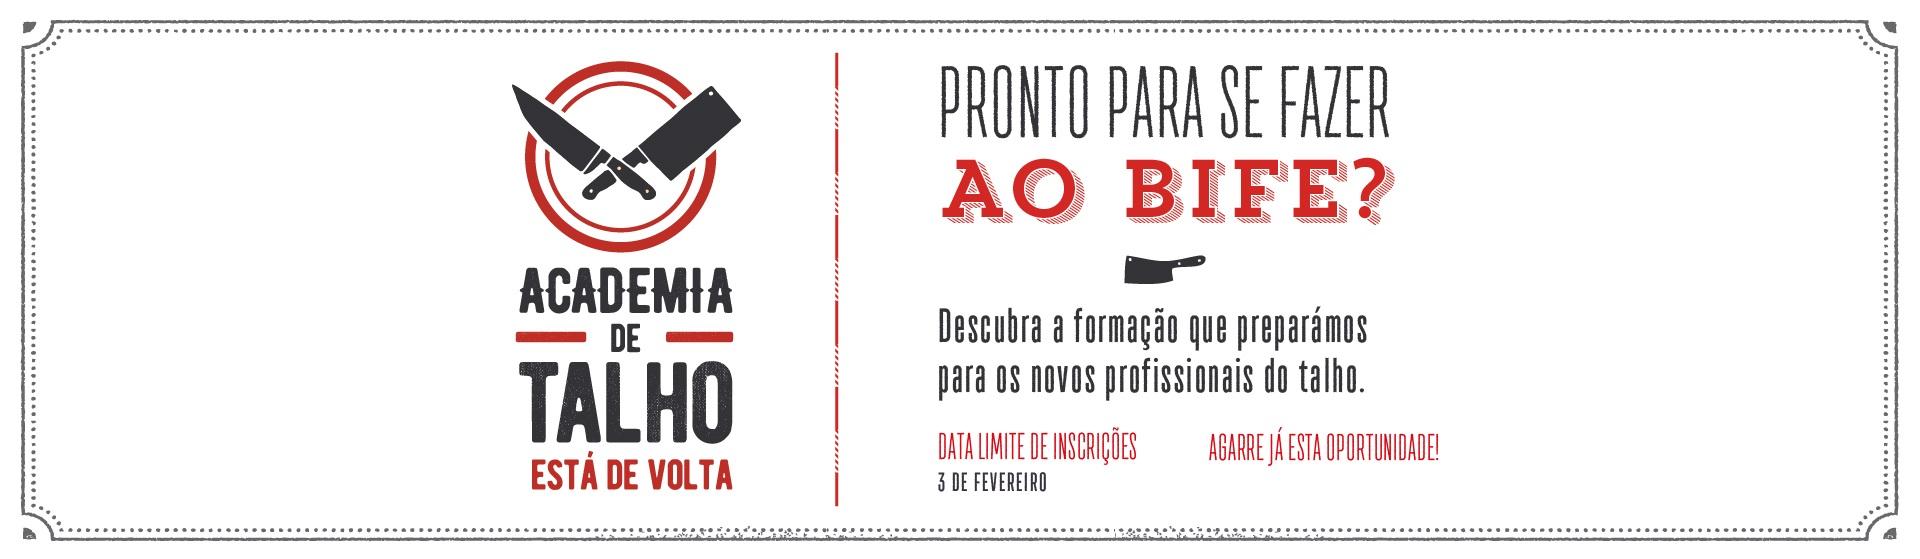 JMRH_Recheio_Academia_Talho_2aEdicao_Banners_Site_1920x559-Copy